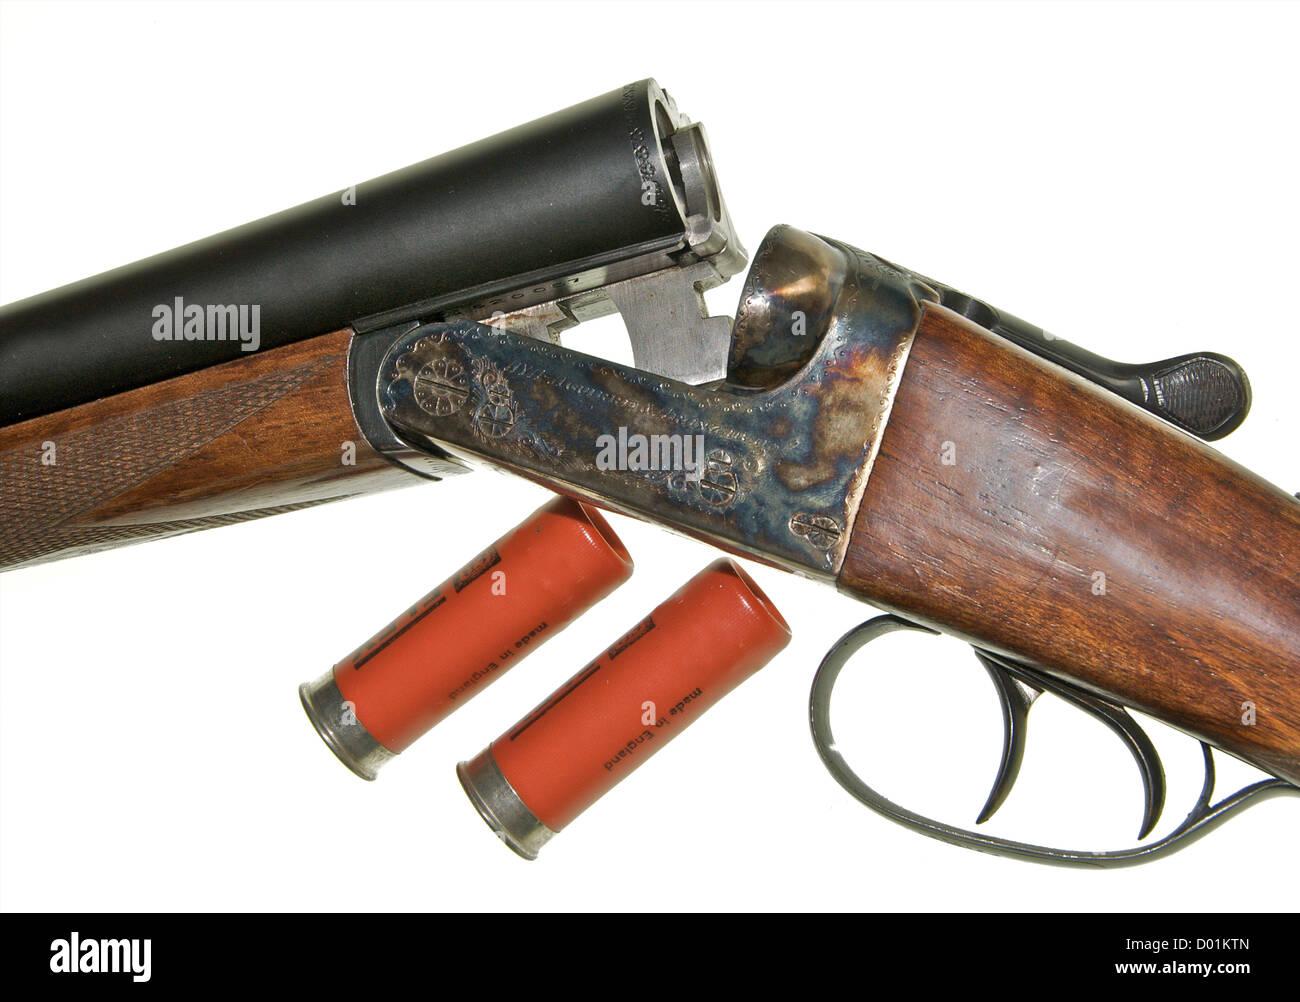 Shotgun 12 gauge bore shotgun This is an AYA No 4 Boxlock side-by-side double barreled gun 'broken' to insert - Stock Image